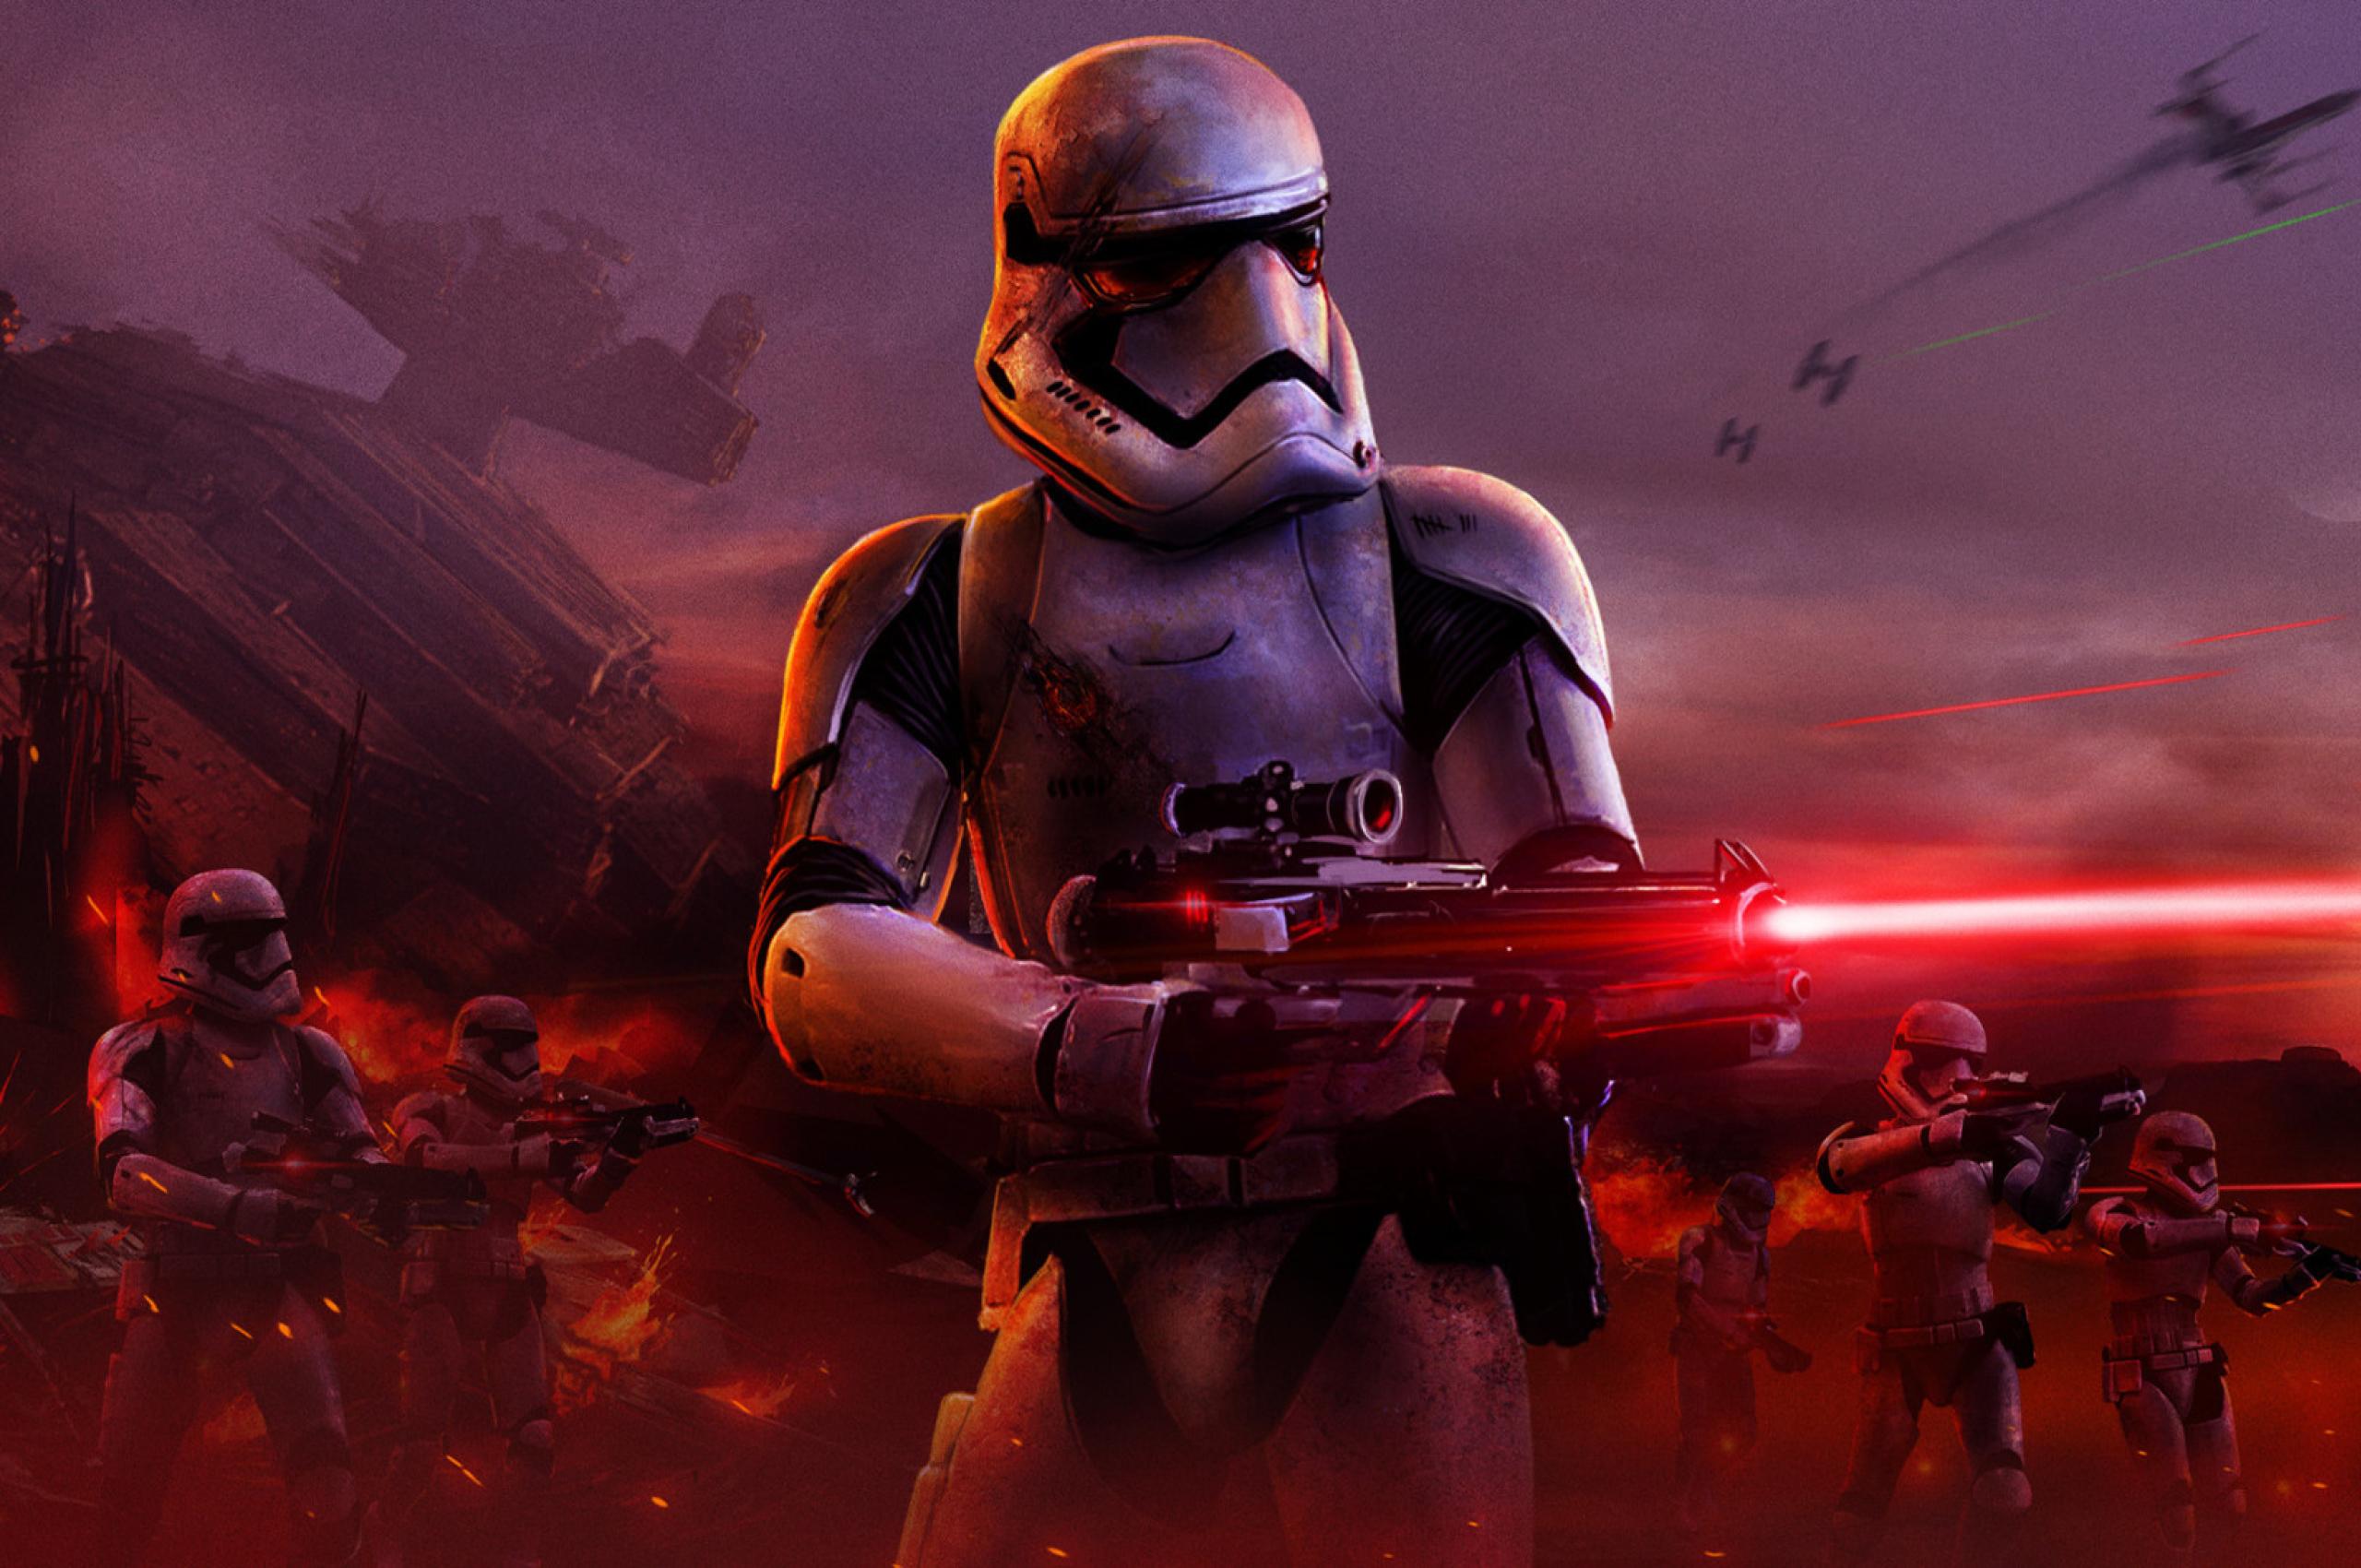 2560x1700 Stormtrooper Chromebook Pixel Wallpaper, HD ...